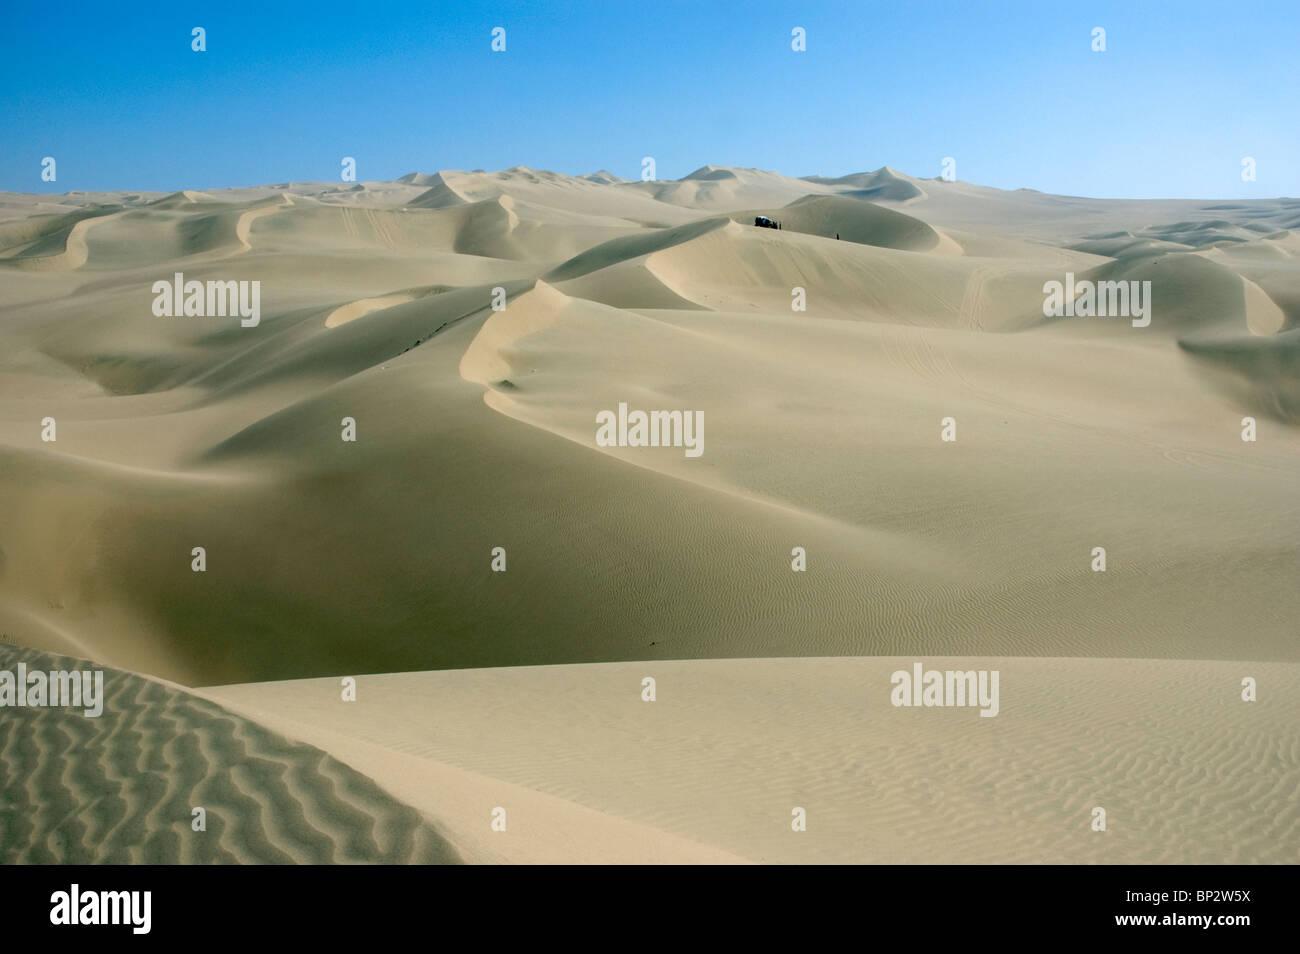 The vast desert sand dunes near the Huacachina Oasis, Ica, Peru. - Stock Image